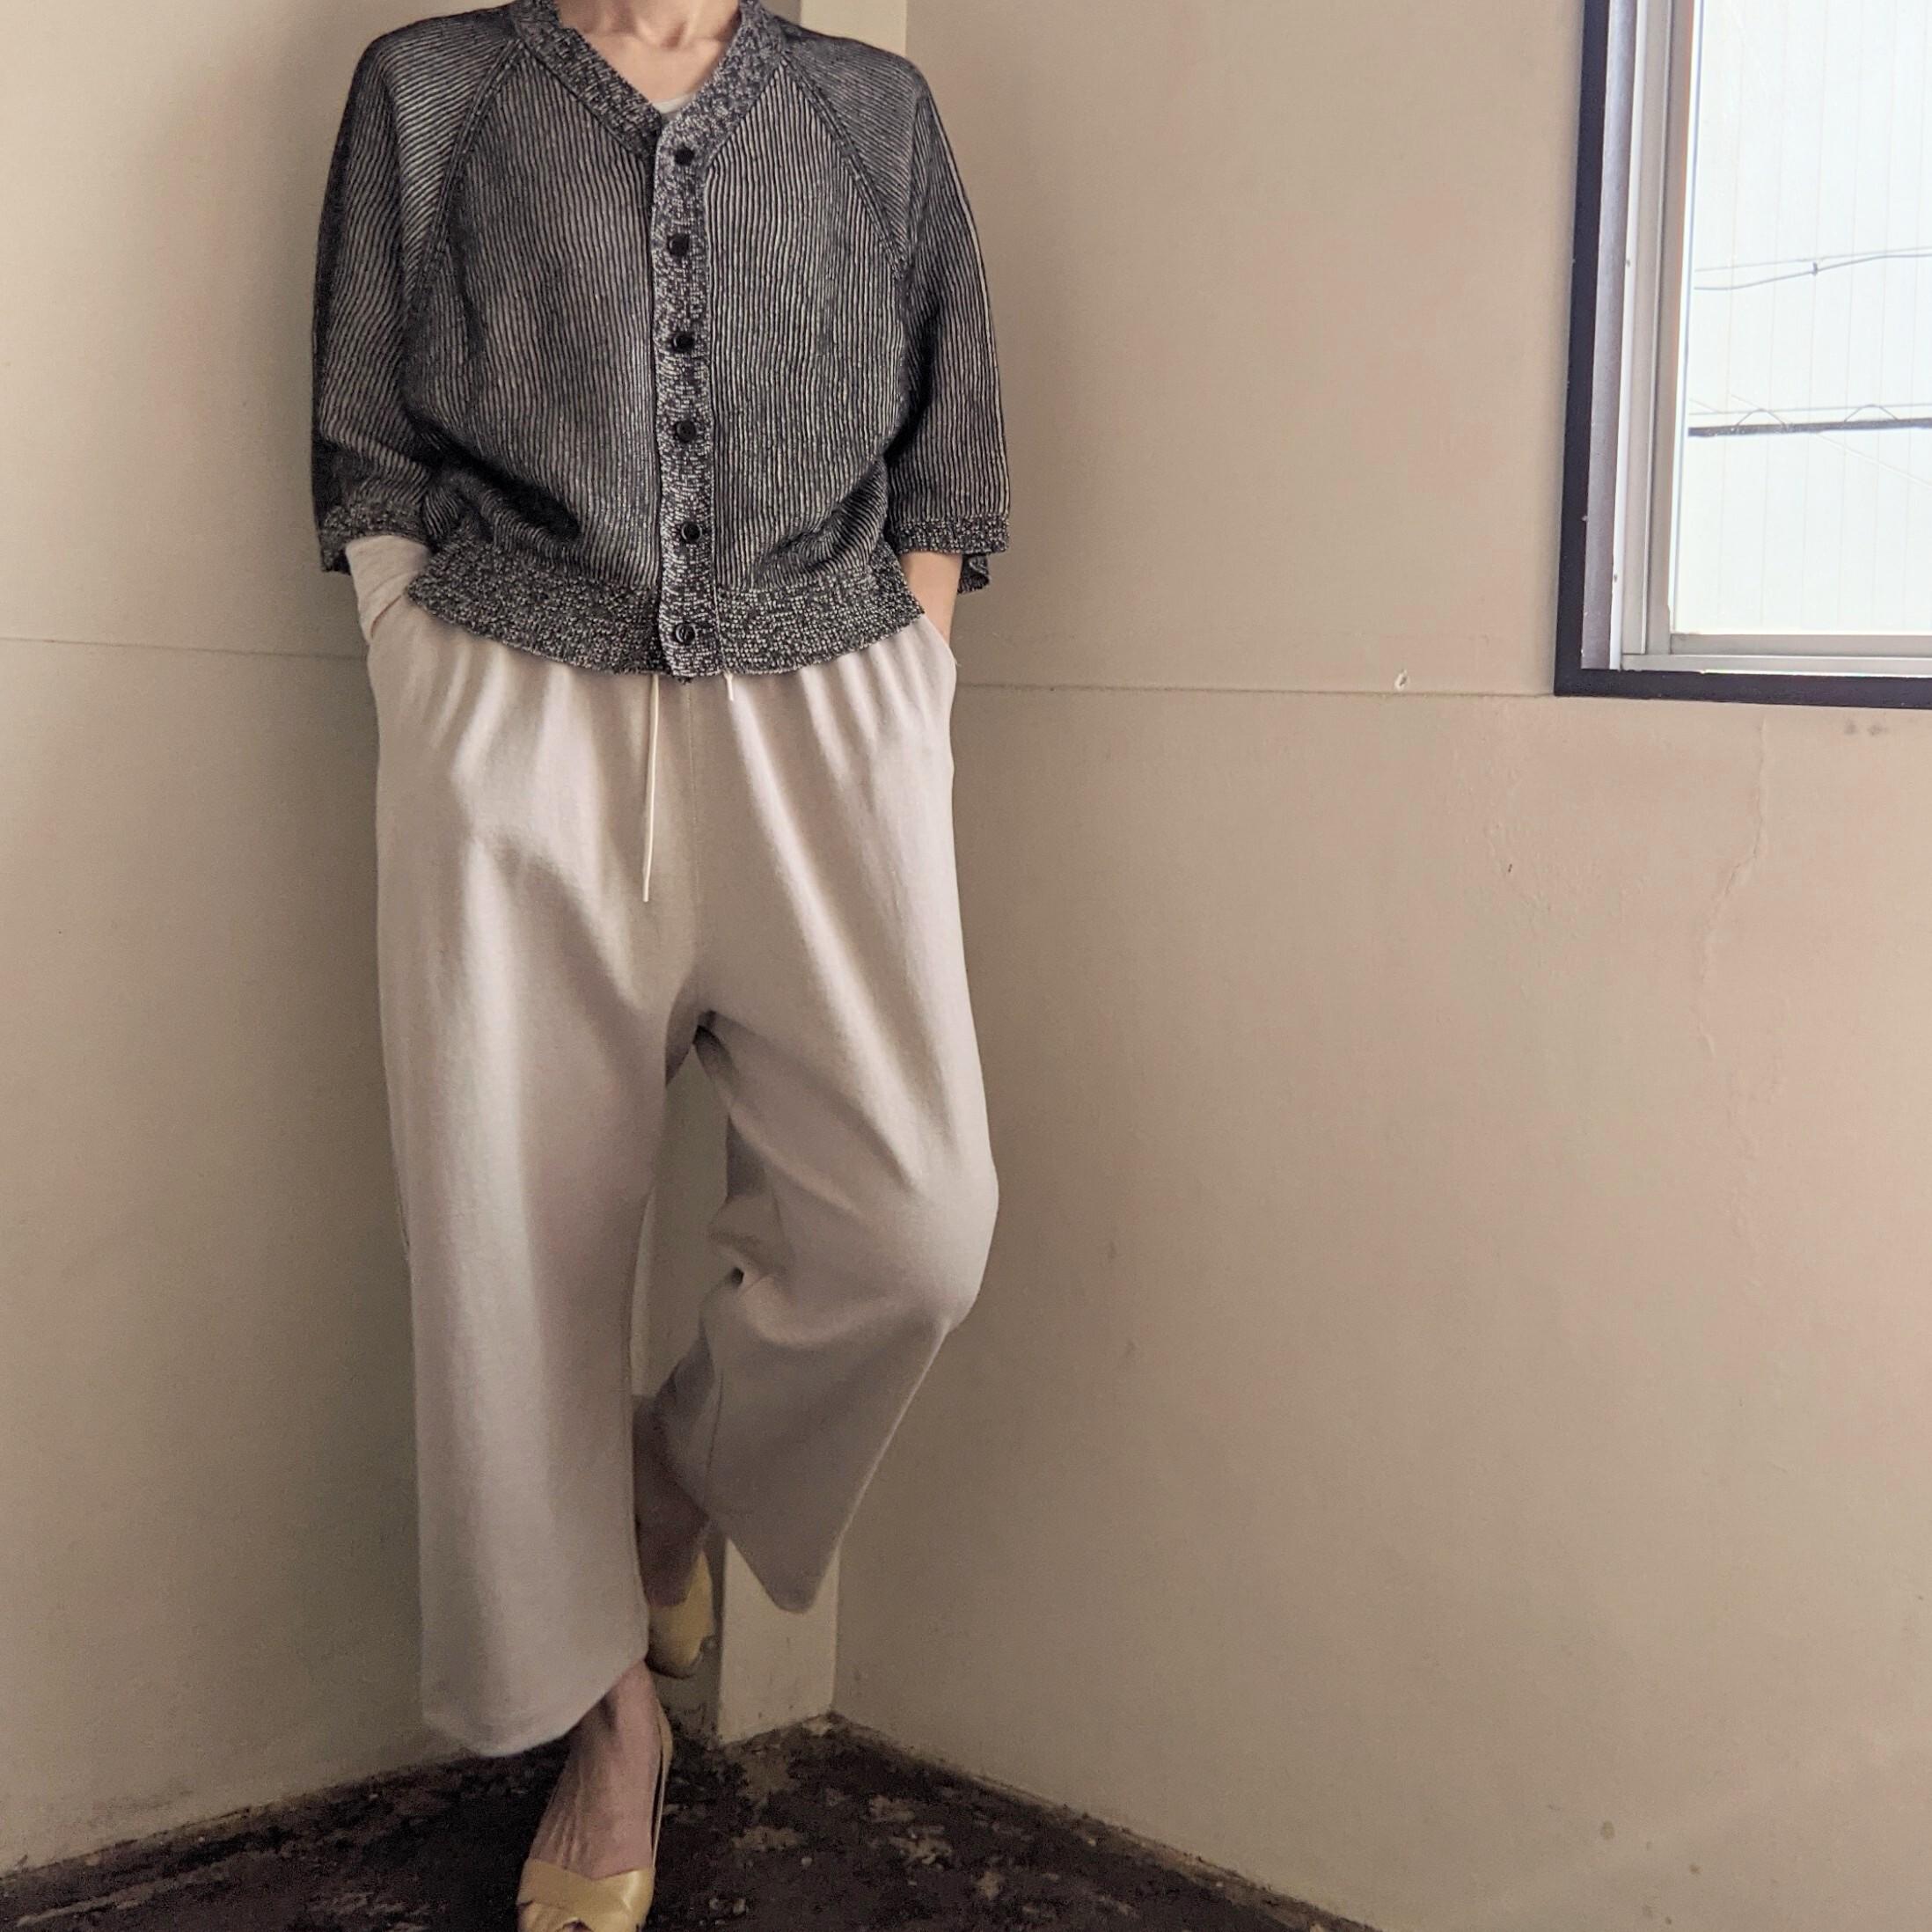 ☆BEIGEのみ☆【 CLOSELY CLICK PEBBLE 】クロースリークリックペブル / easy tapered pants / イージーテーパードパンツ / beige,navy